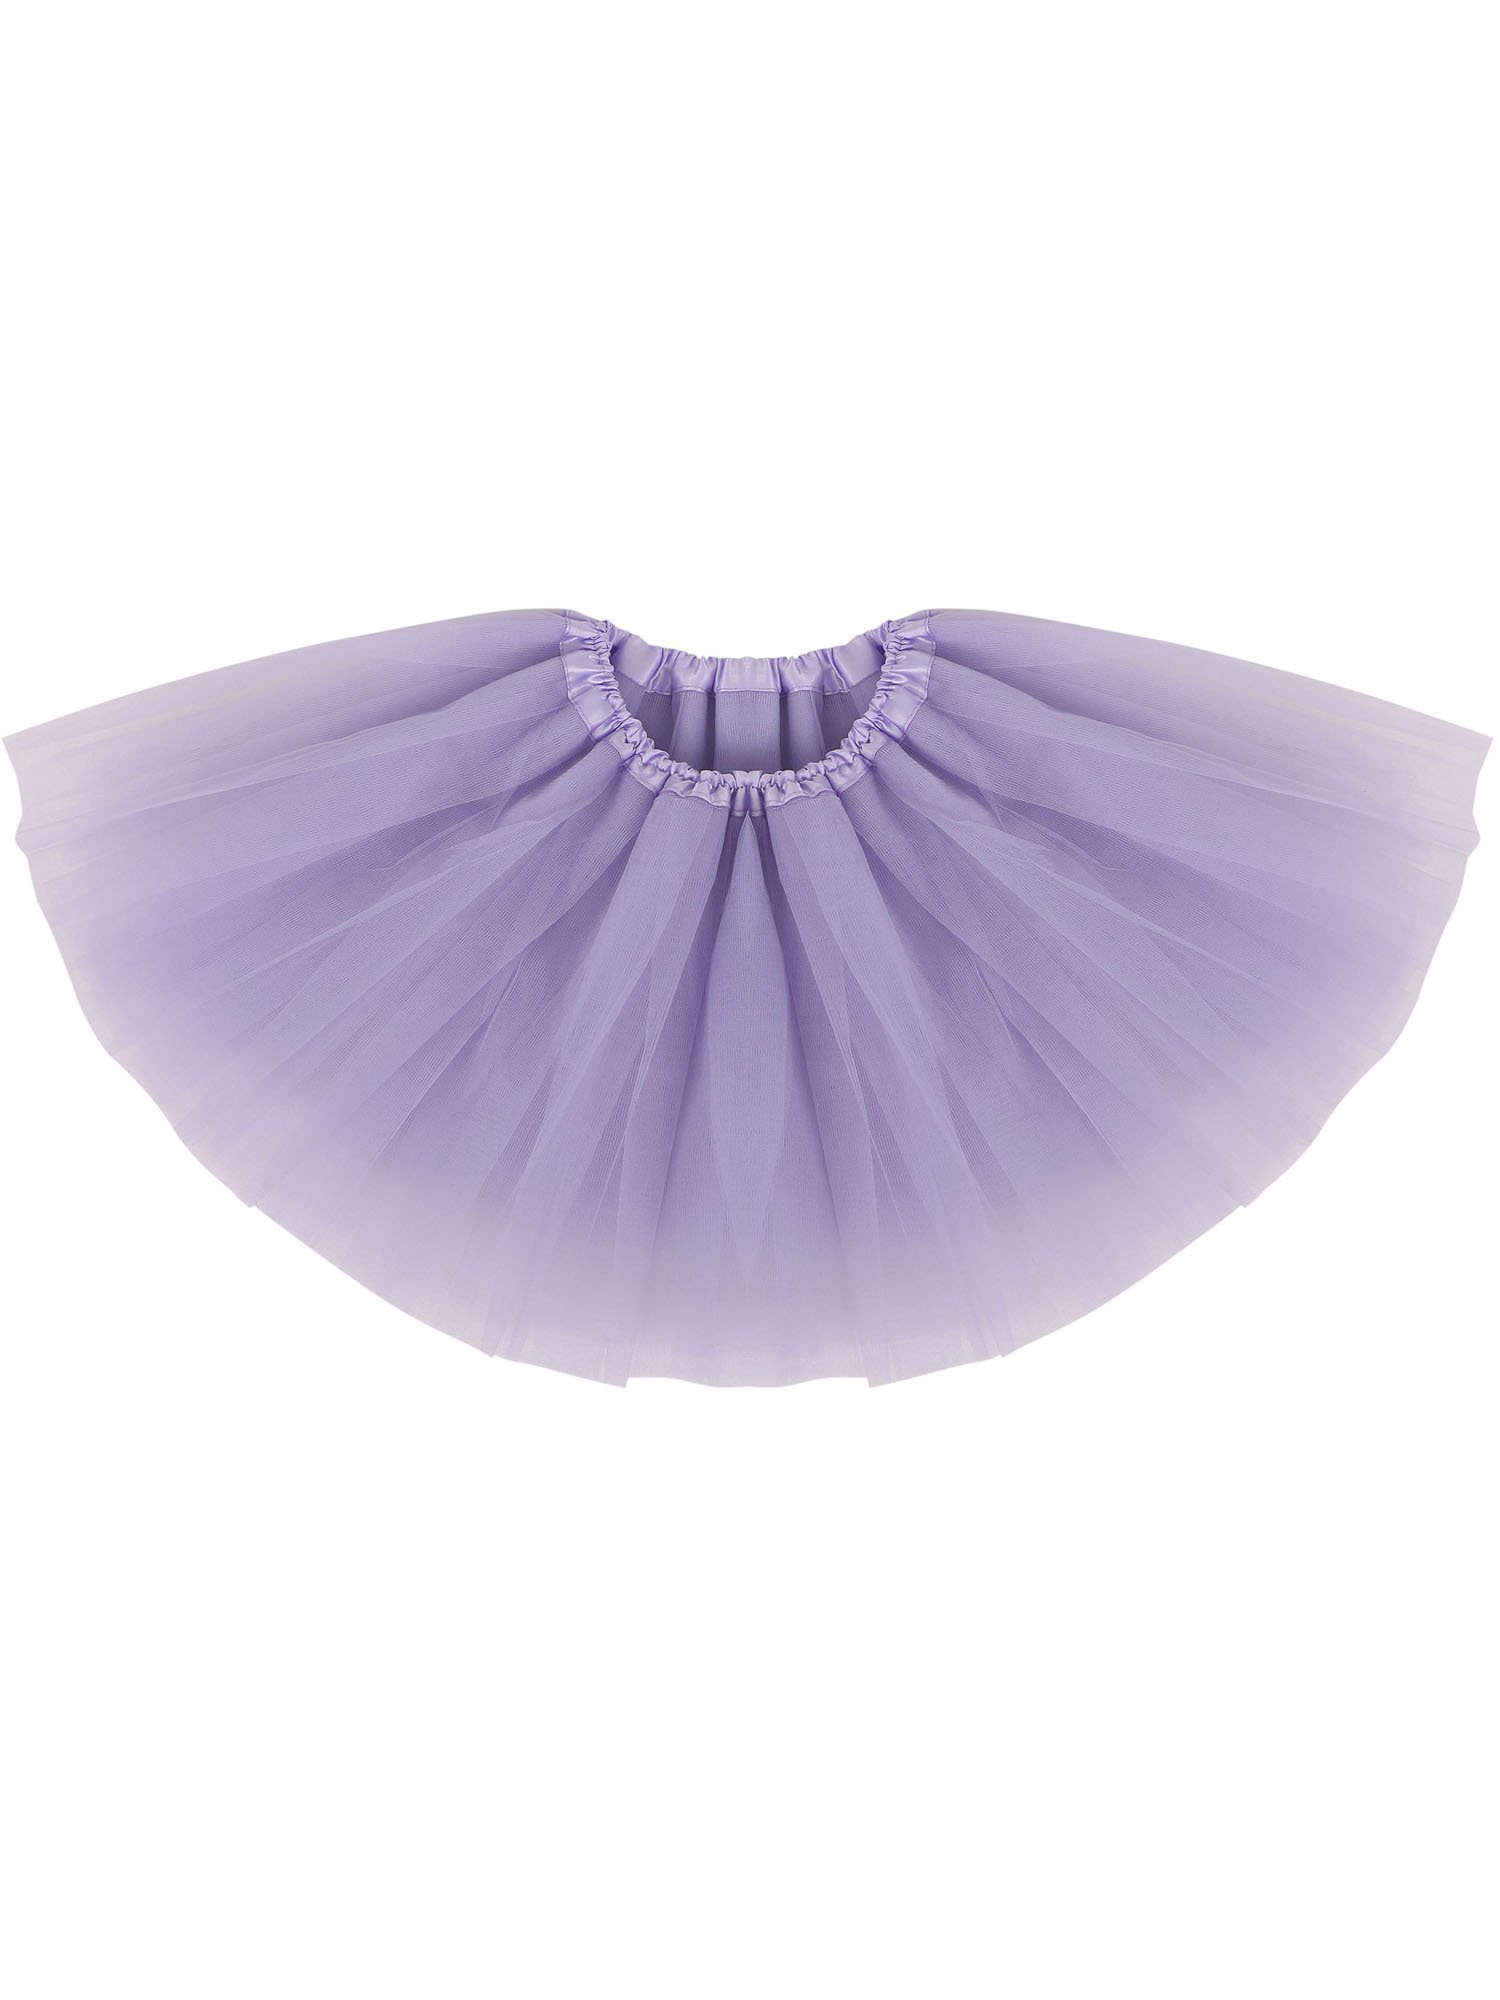 Simplicity Infant Tulle Dance Tutu Skirt for Dress Up & Fairy Costume,Lavender